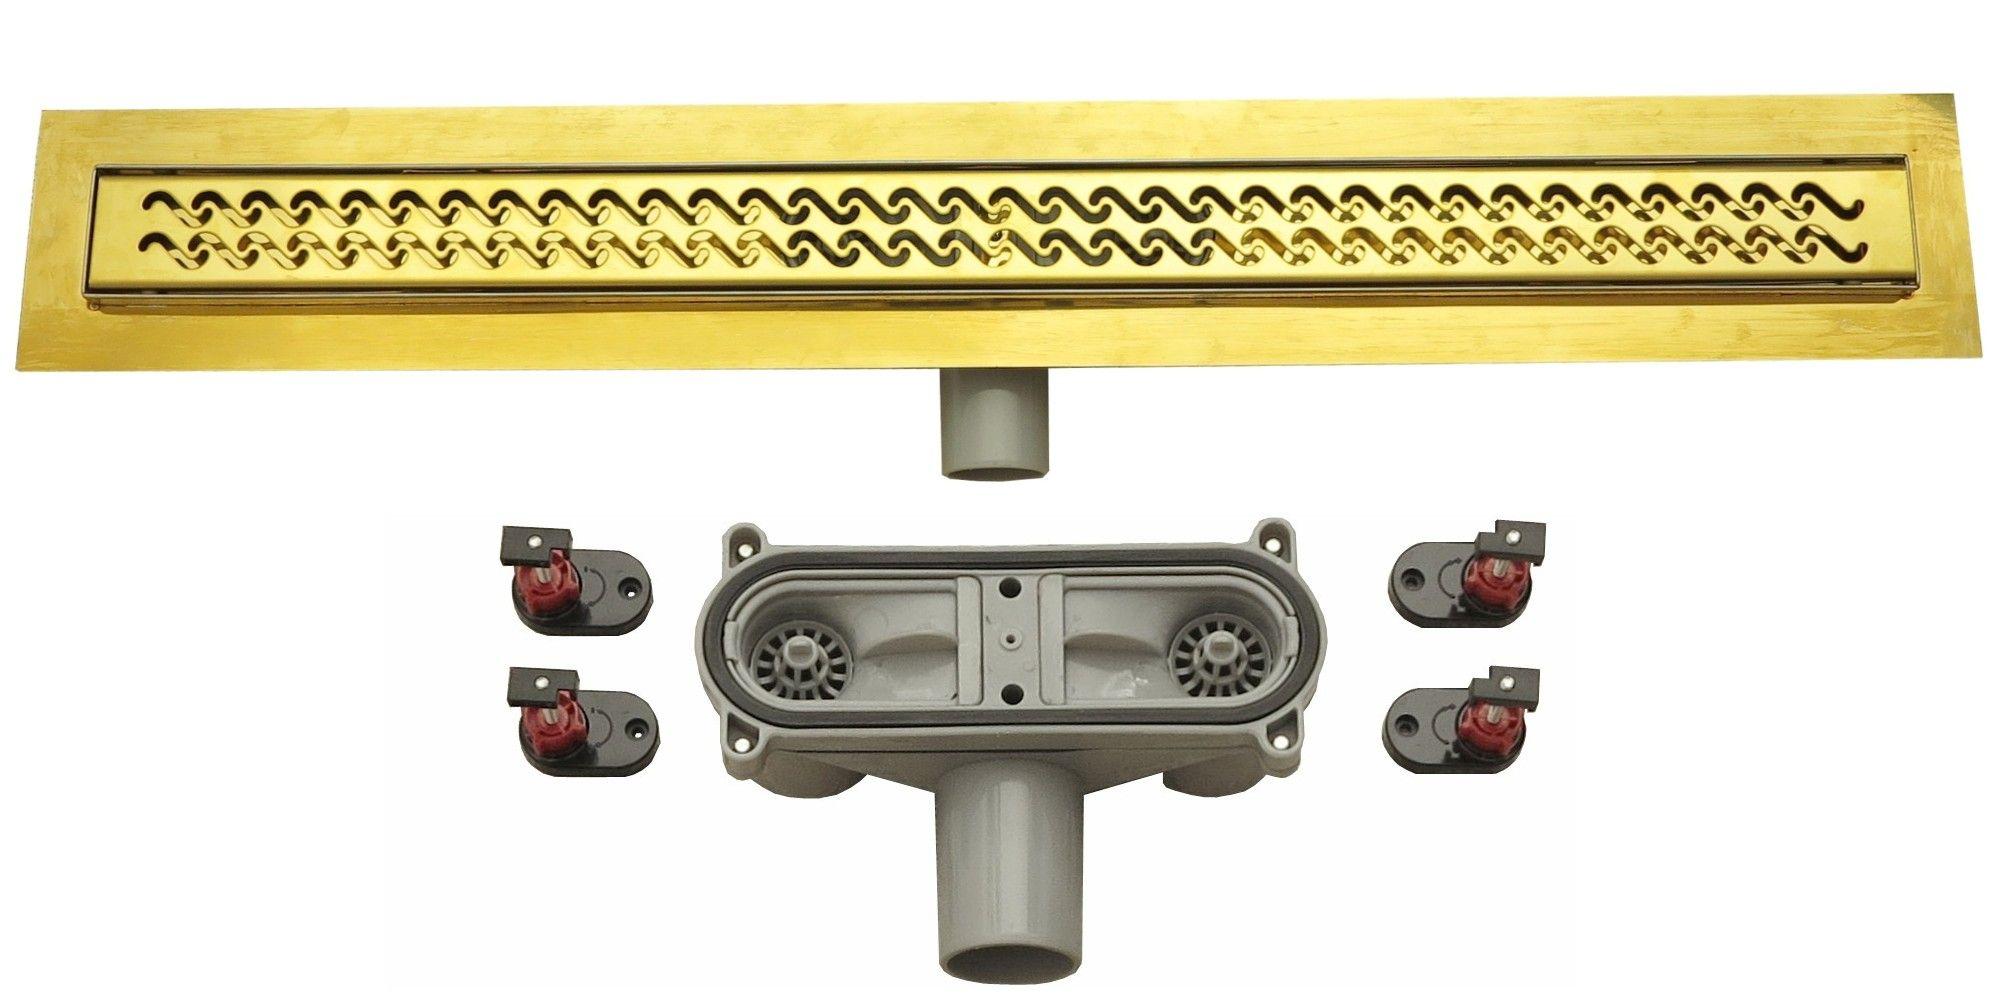 flach siphon waschbecken flach siphon dn32 40 waschtisch. Black Bedroom Furniture Sets. Home Design Ideas